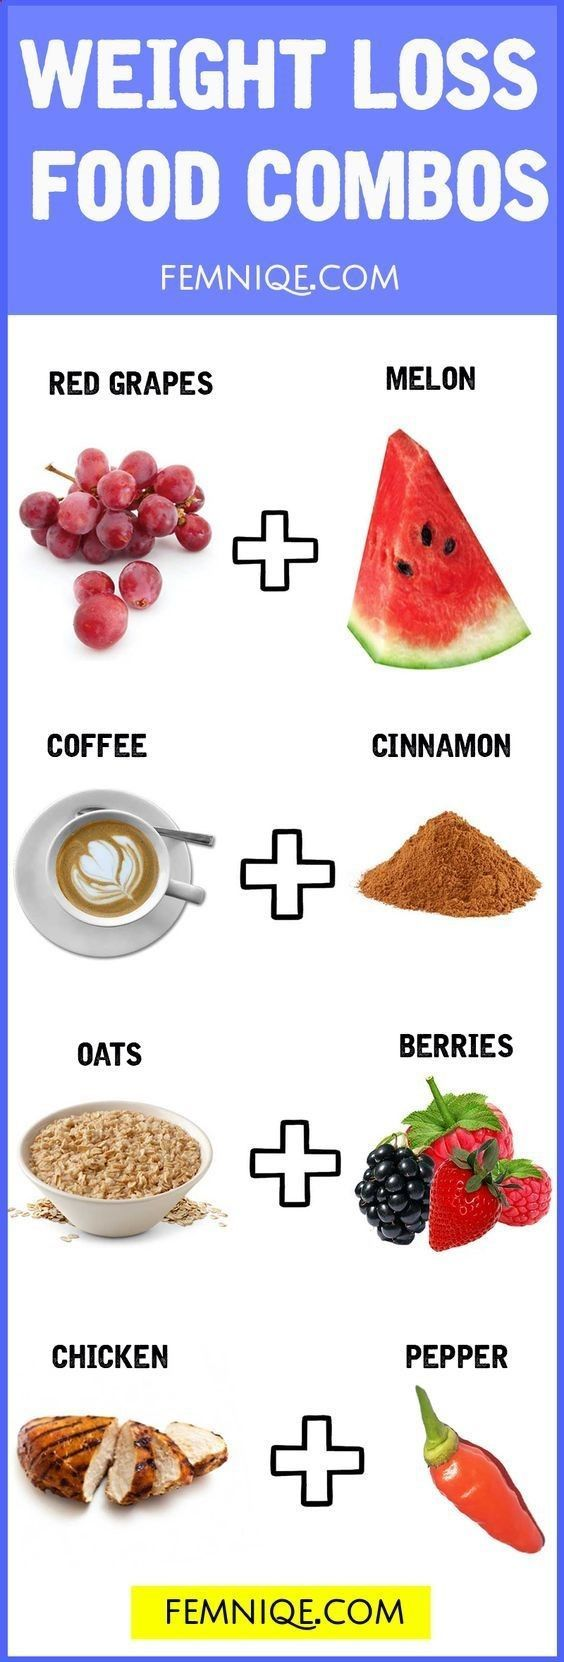 Green juice diet weight loss plan